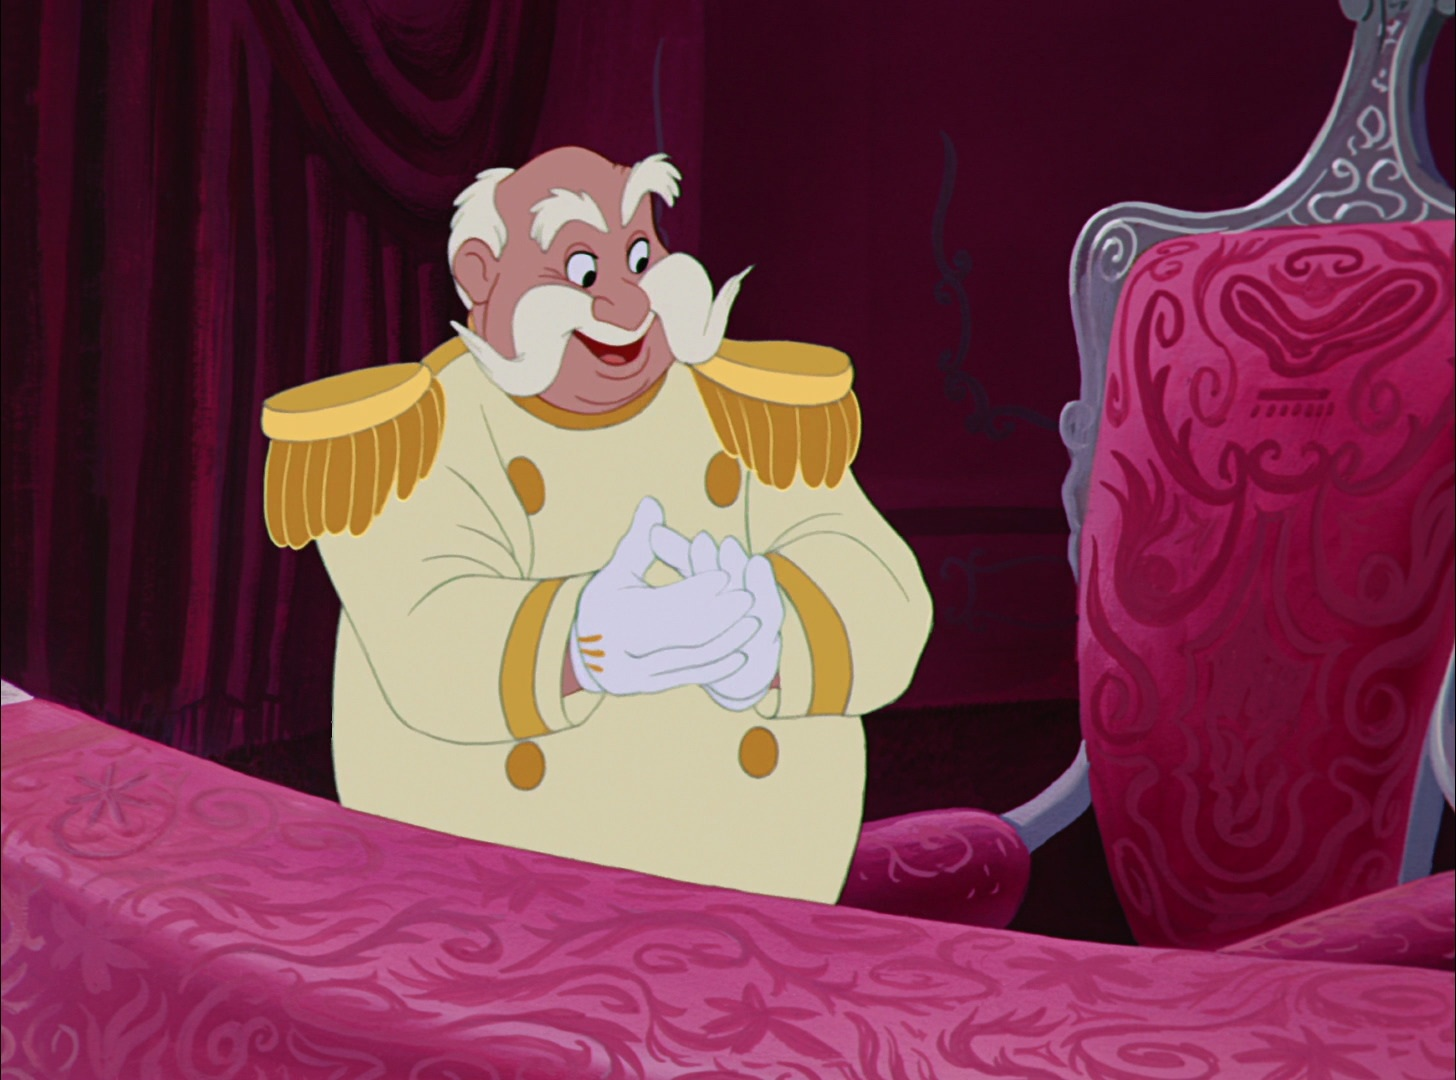 Cinderella-disneyscreencaps.com-5880.jpg